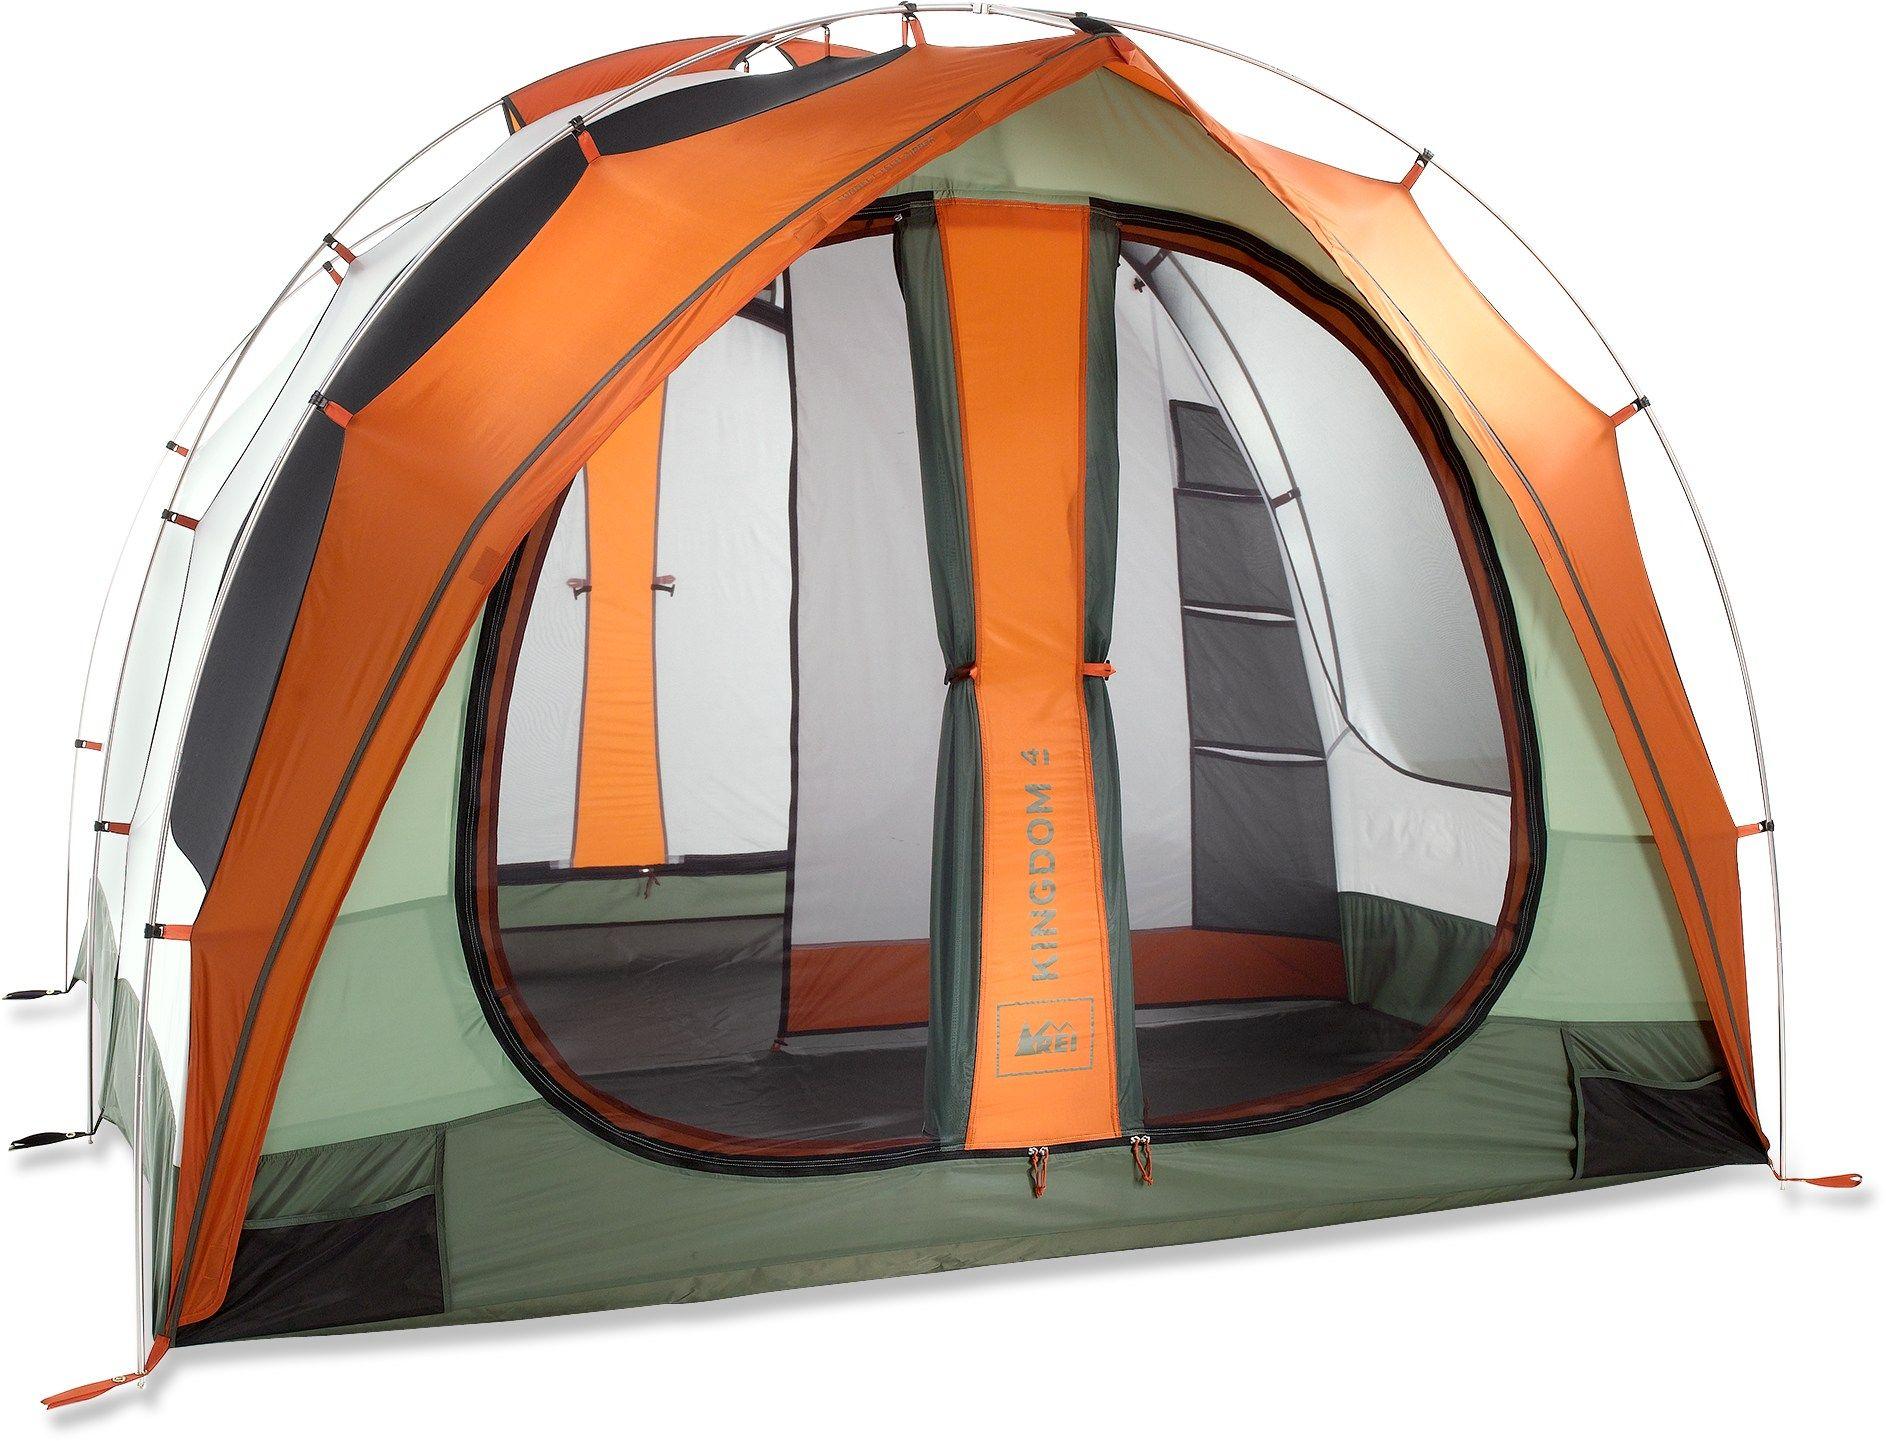 REI Kingdom 4 Tent - REI.com  sc 1 st  Pinterest & REI Kingdom 4 Tent - REI.com | Outdoor | Pinterest | Tents ...